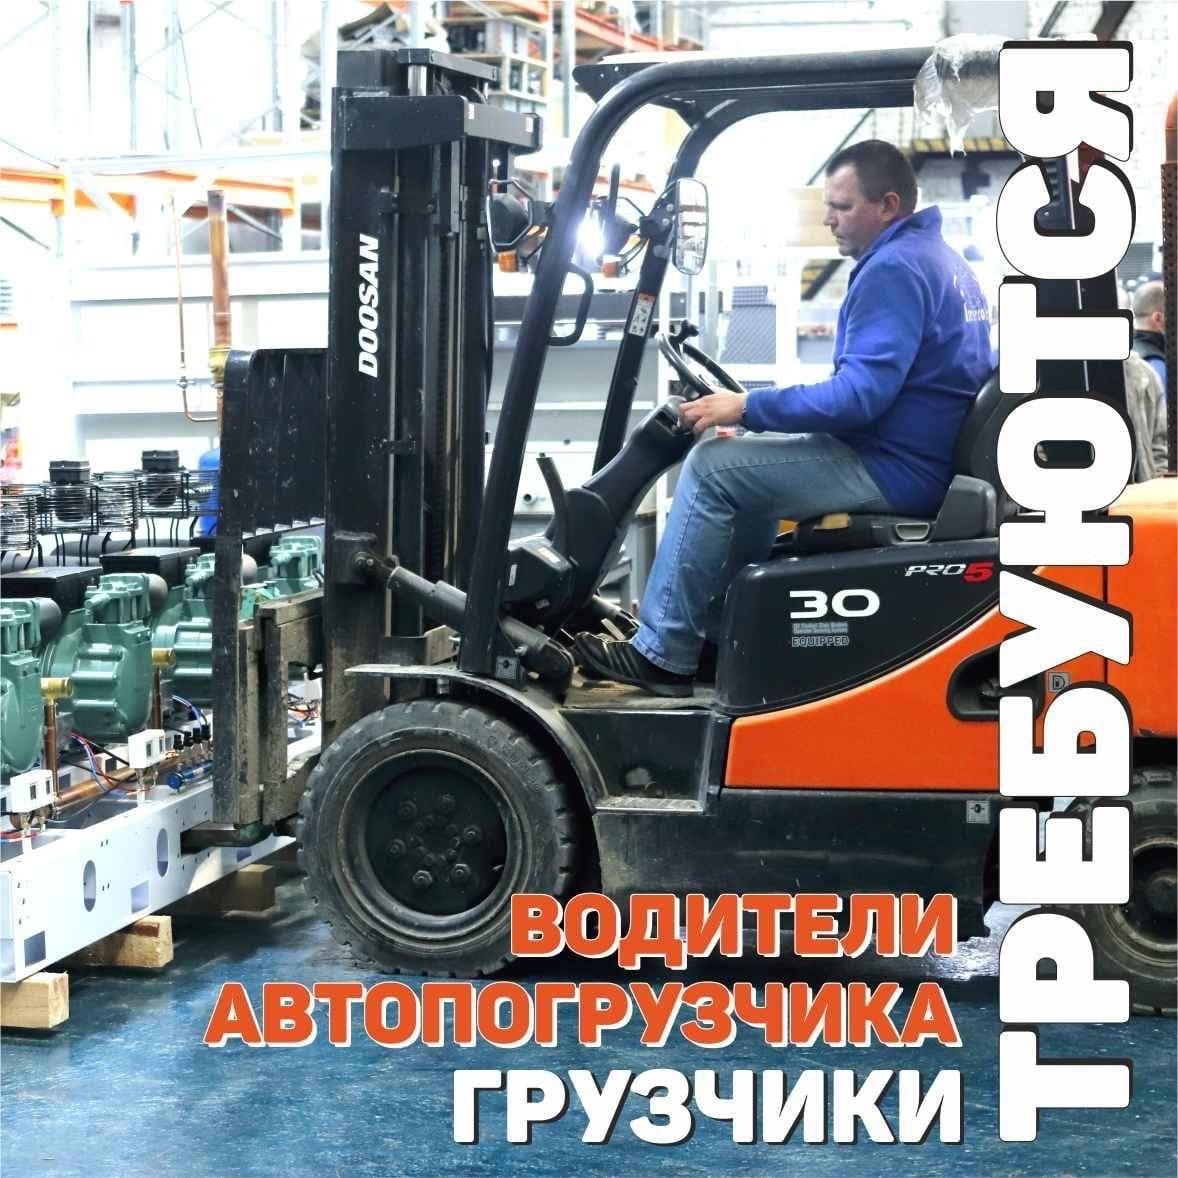 На склад торгового оборудования